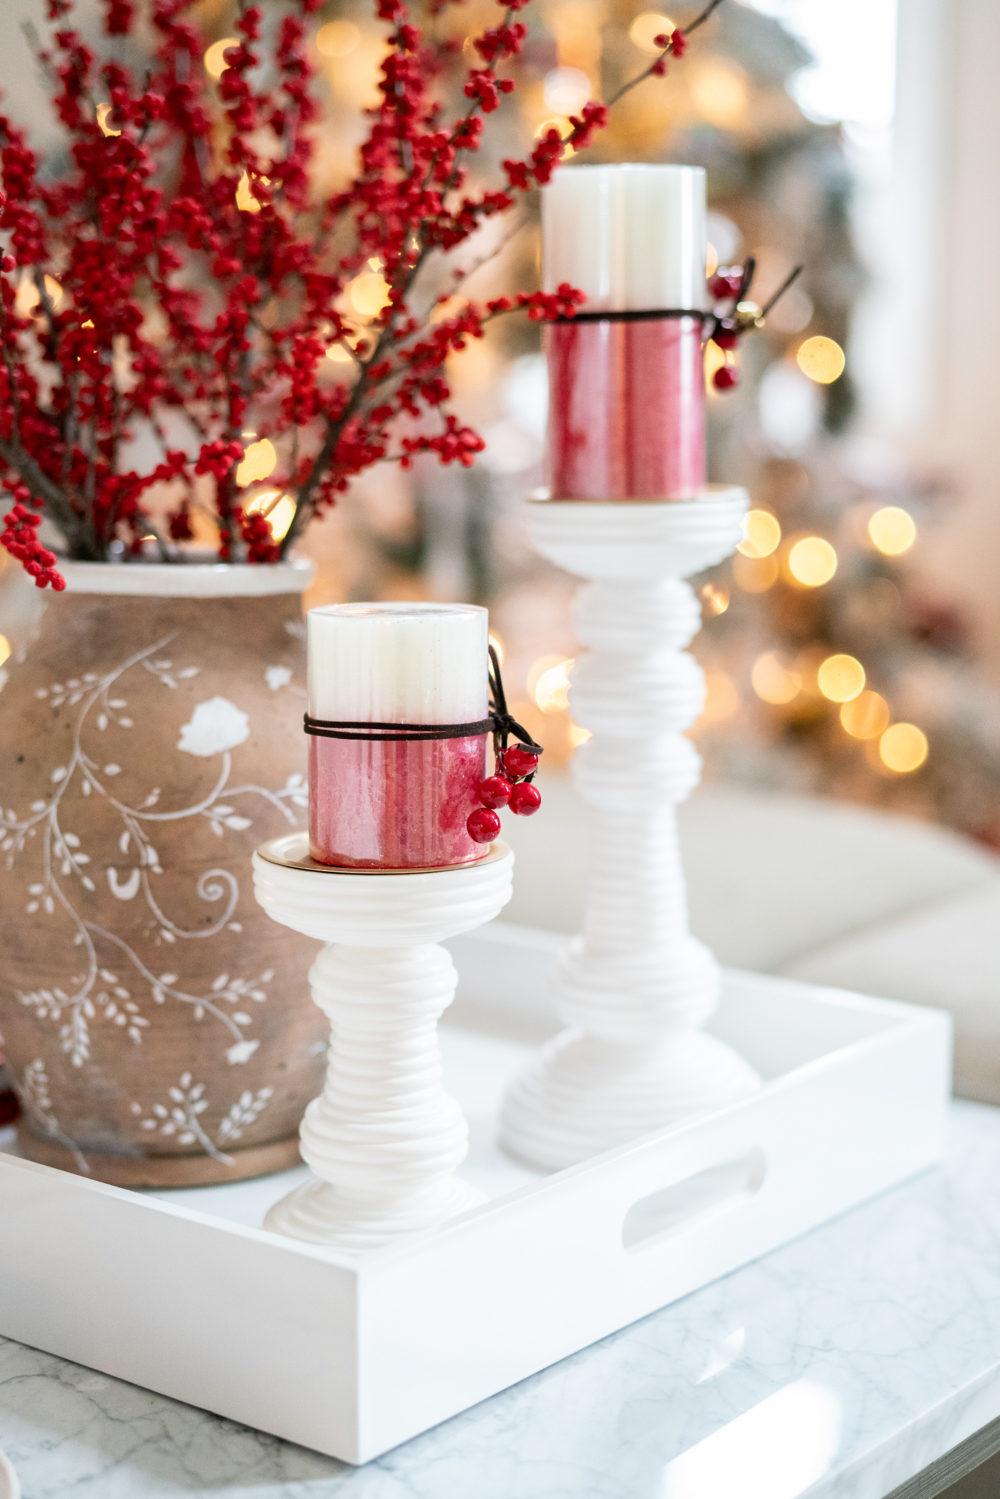 Petite Fashion Blog | Our Home for the Holidays | Christmas Decor | Flocked Christmas Tree | Christmas Pillows